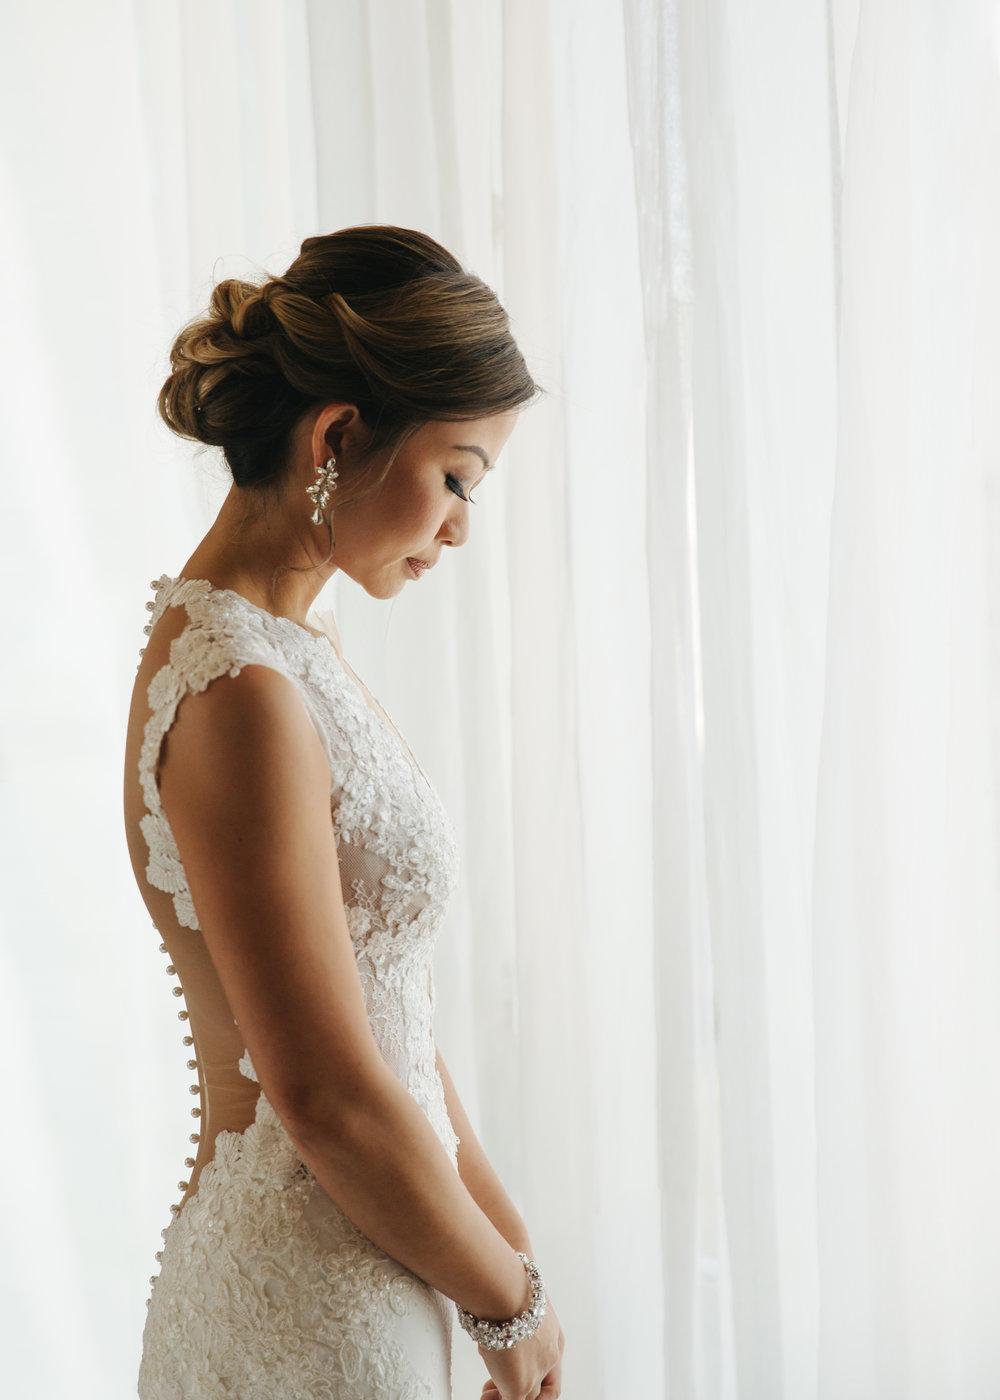 herastudios_wedding_kim_trevor_hera_selects-36.jpg